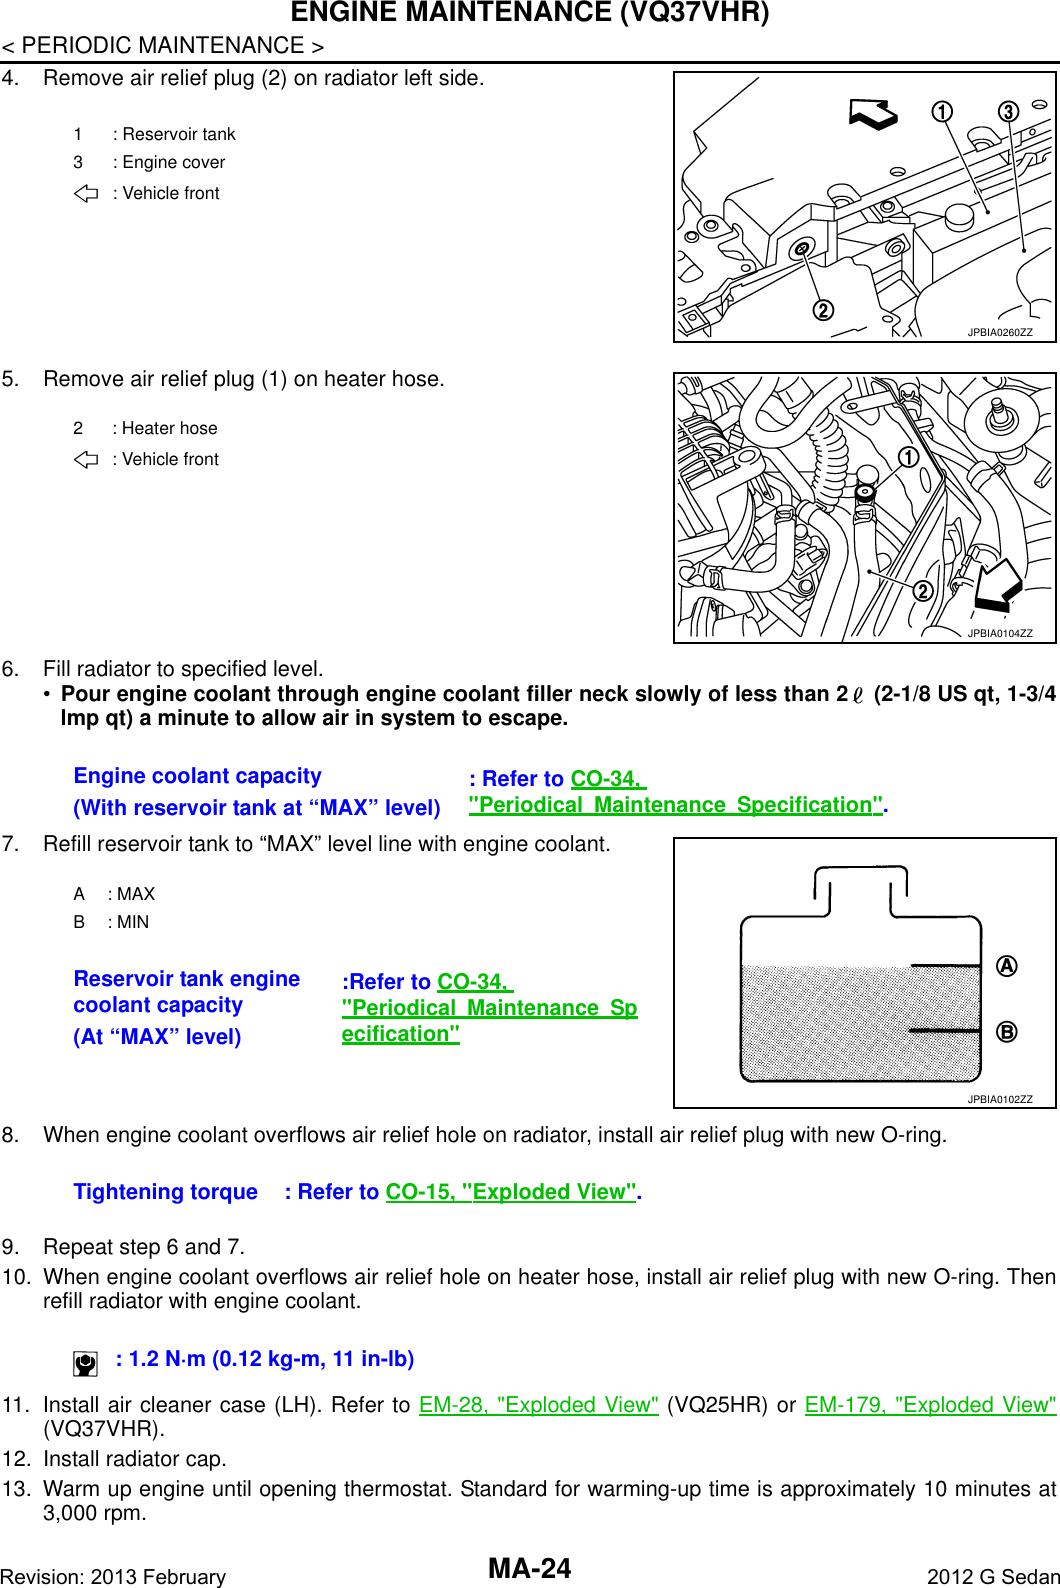 Infiniti 2012 G37 Maintenance Manual Config(MA)